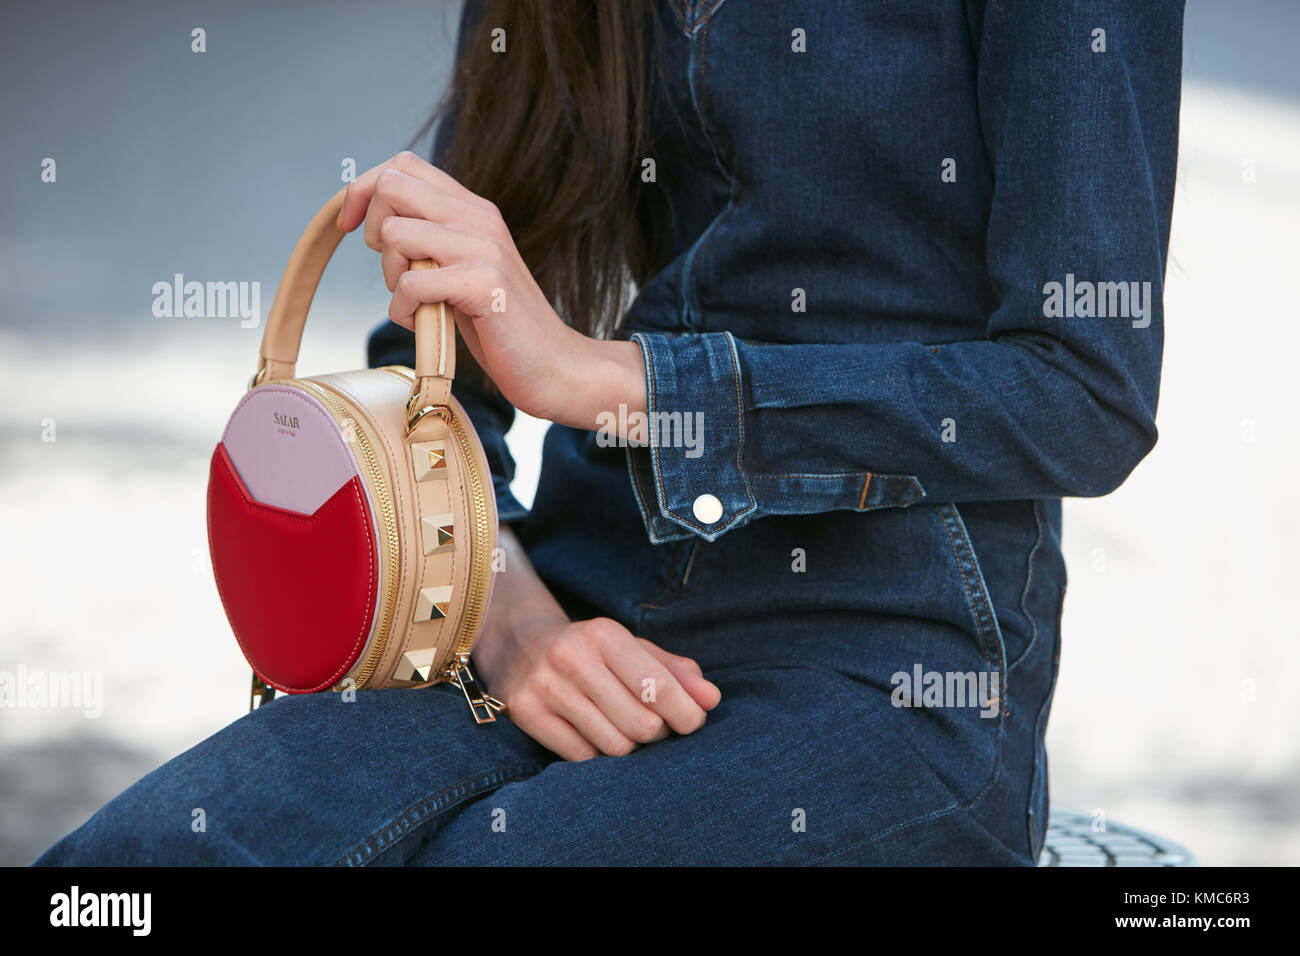 Milan - 23 septembre   femme avec salar rouge et beige et bleu Sac en cuir  bleu jeans blumarine avant fashion show, Milan Fashion week street styl 90299a05628